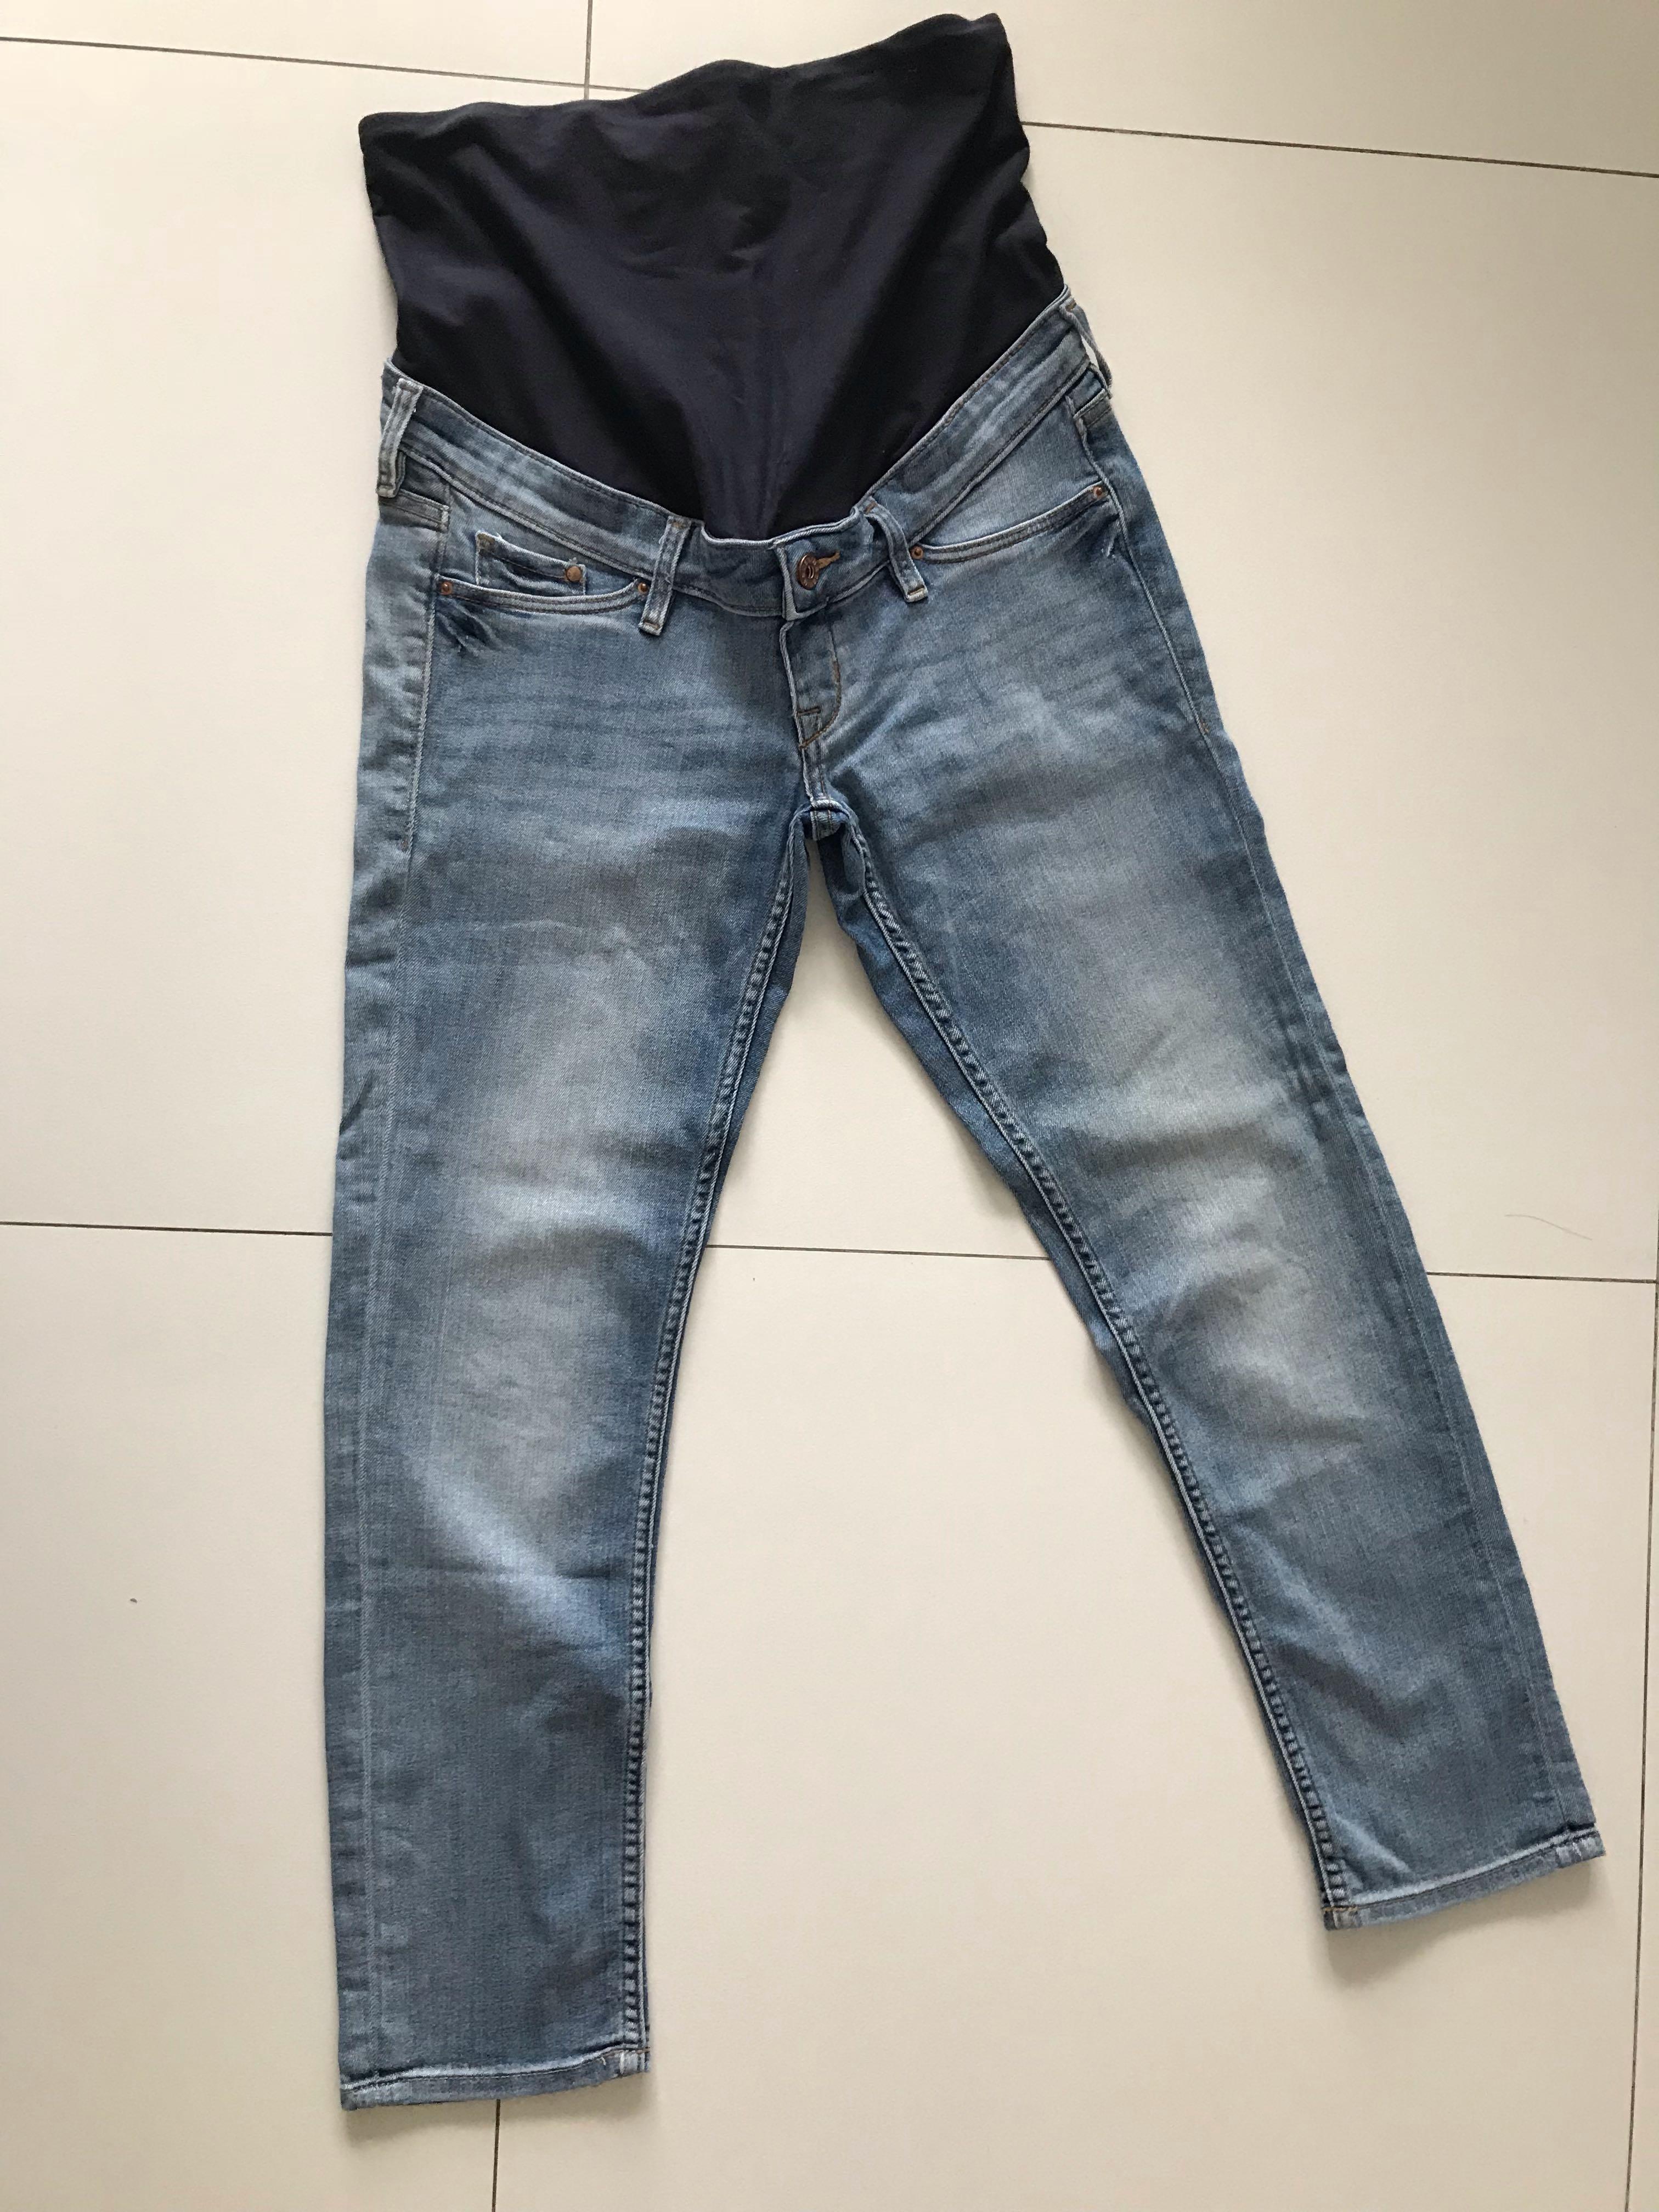 dee2588daca76 H&M Maternity Jeans skinny size EUR 40, Babies & Kids, Maternity on ...